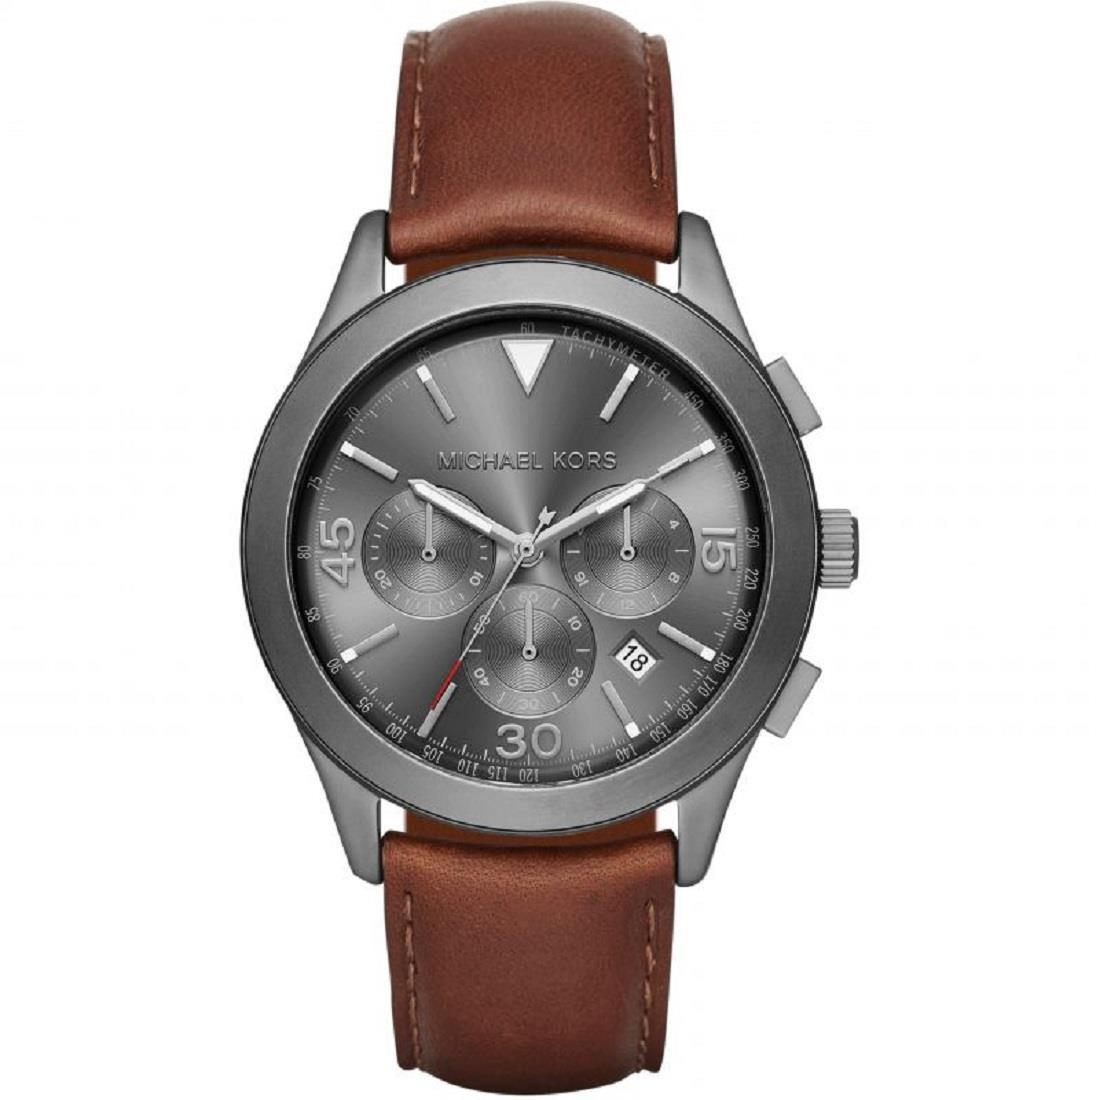 orologio uomo cassa 43mm - MICHAEL KORS